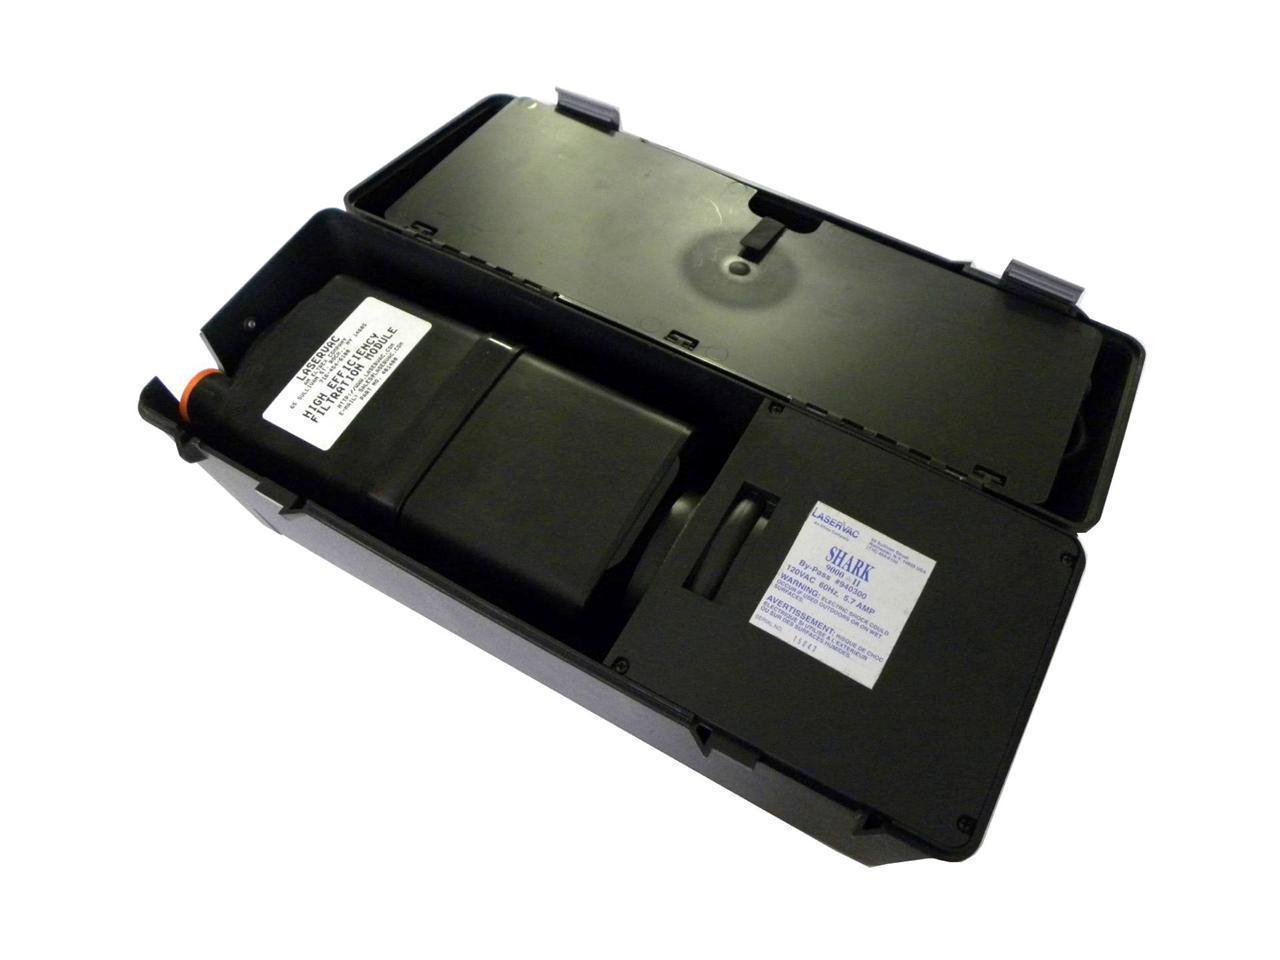 SHARK LAZERVAC VACUUM CLEANER KIT 120V 60HZ 5.7A MODEL 9000-II - $149.99